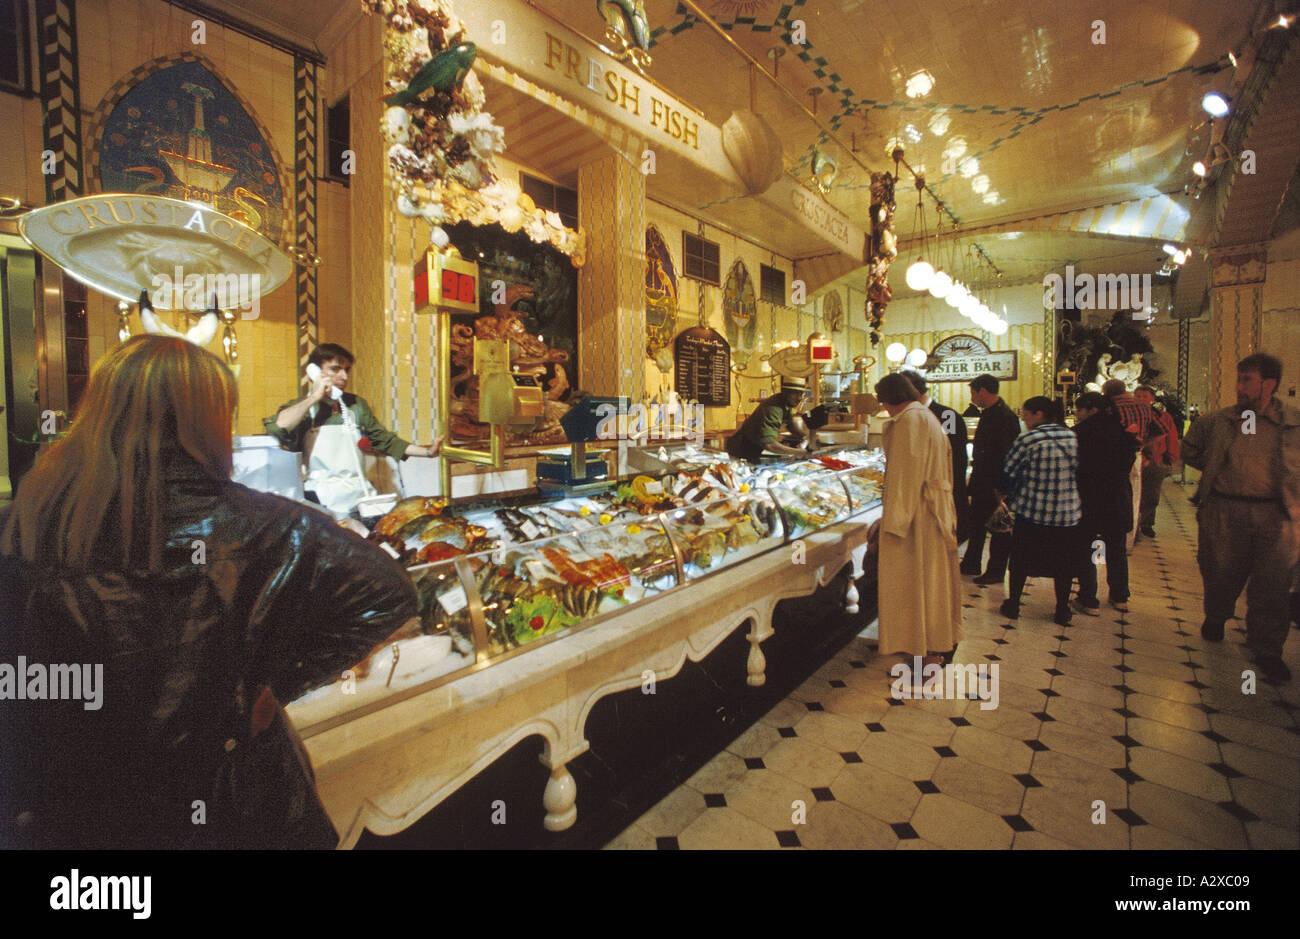 Fish Monger at Harrods Foodhalls - Stock Image